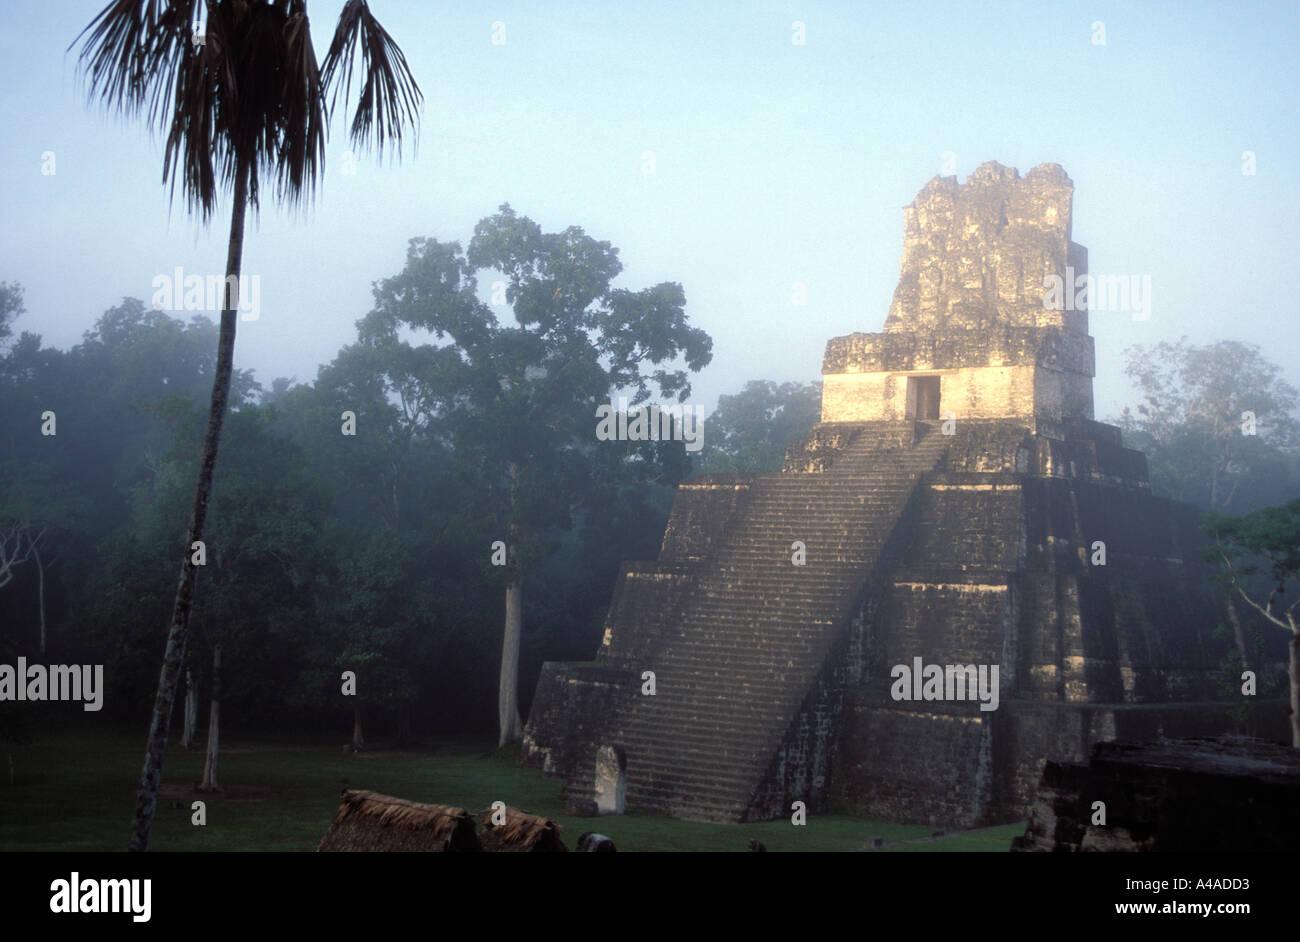 Mayan temple at Tikal Guatemala - Stock Image